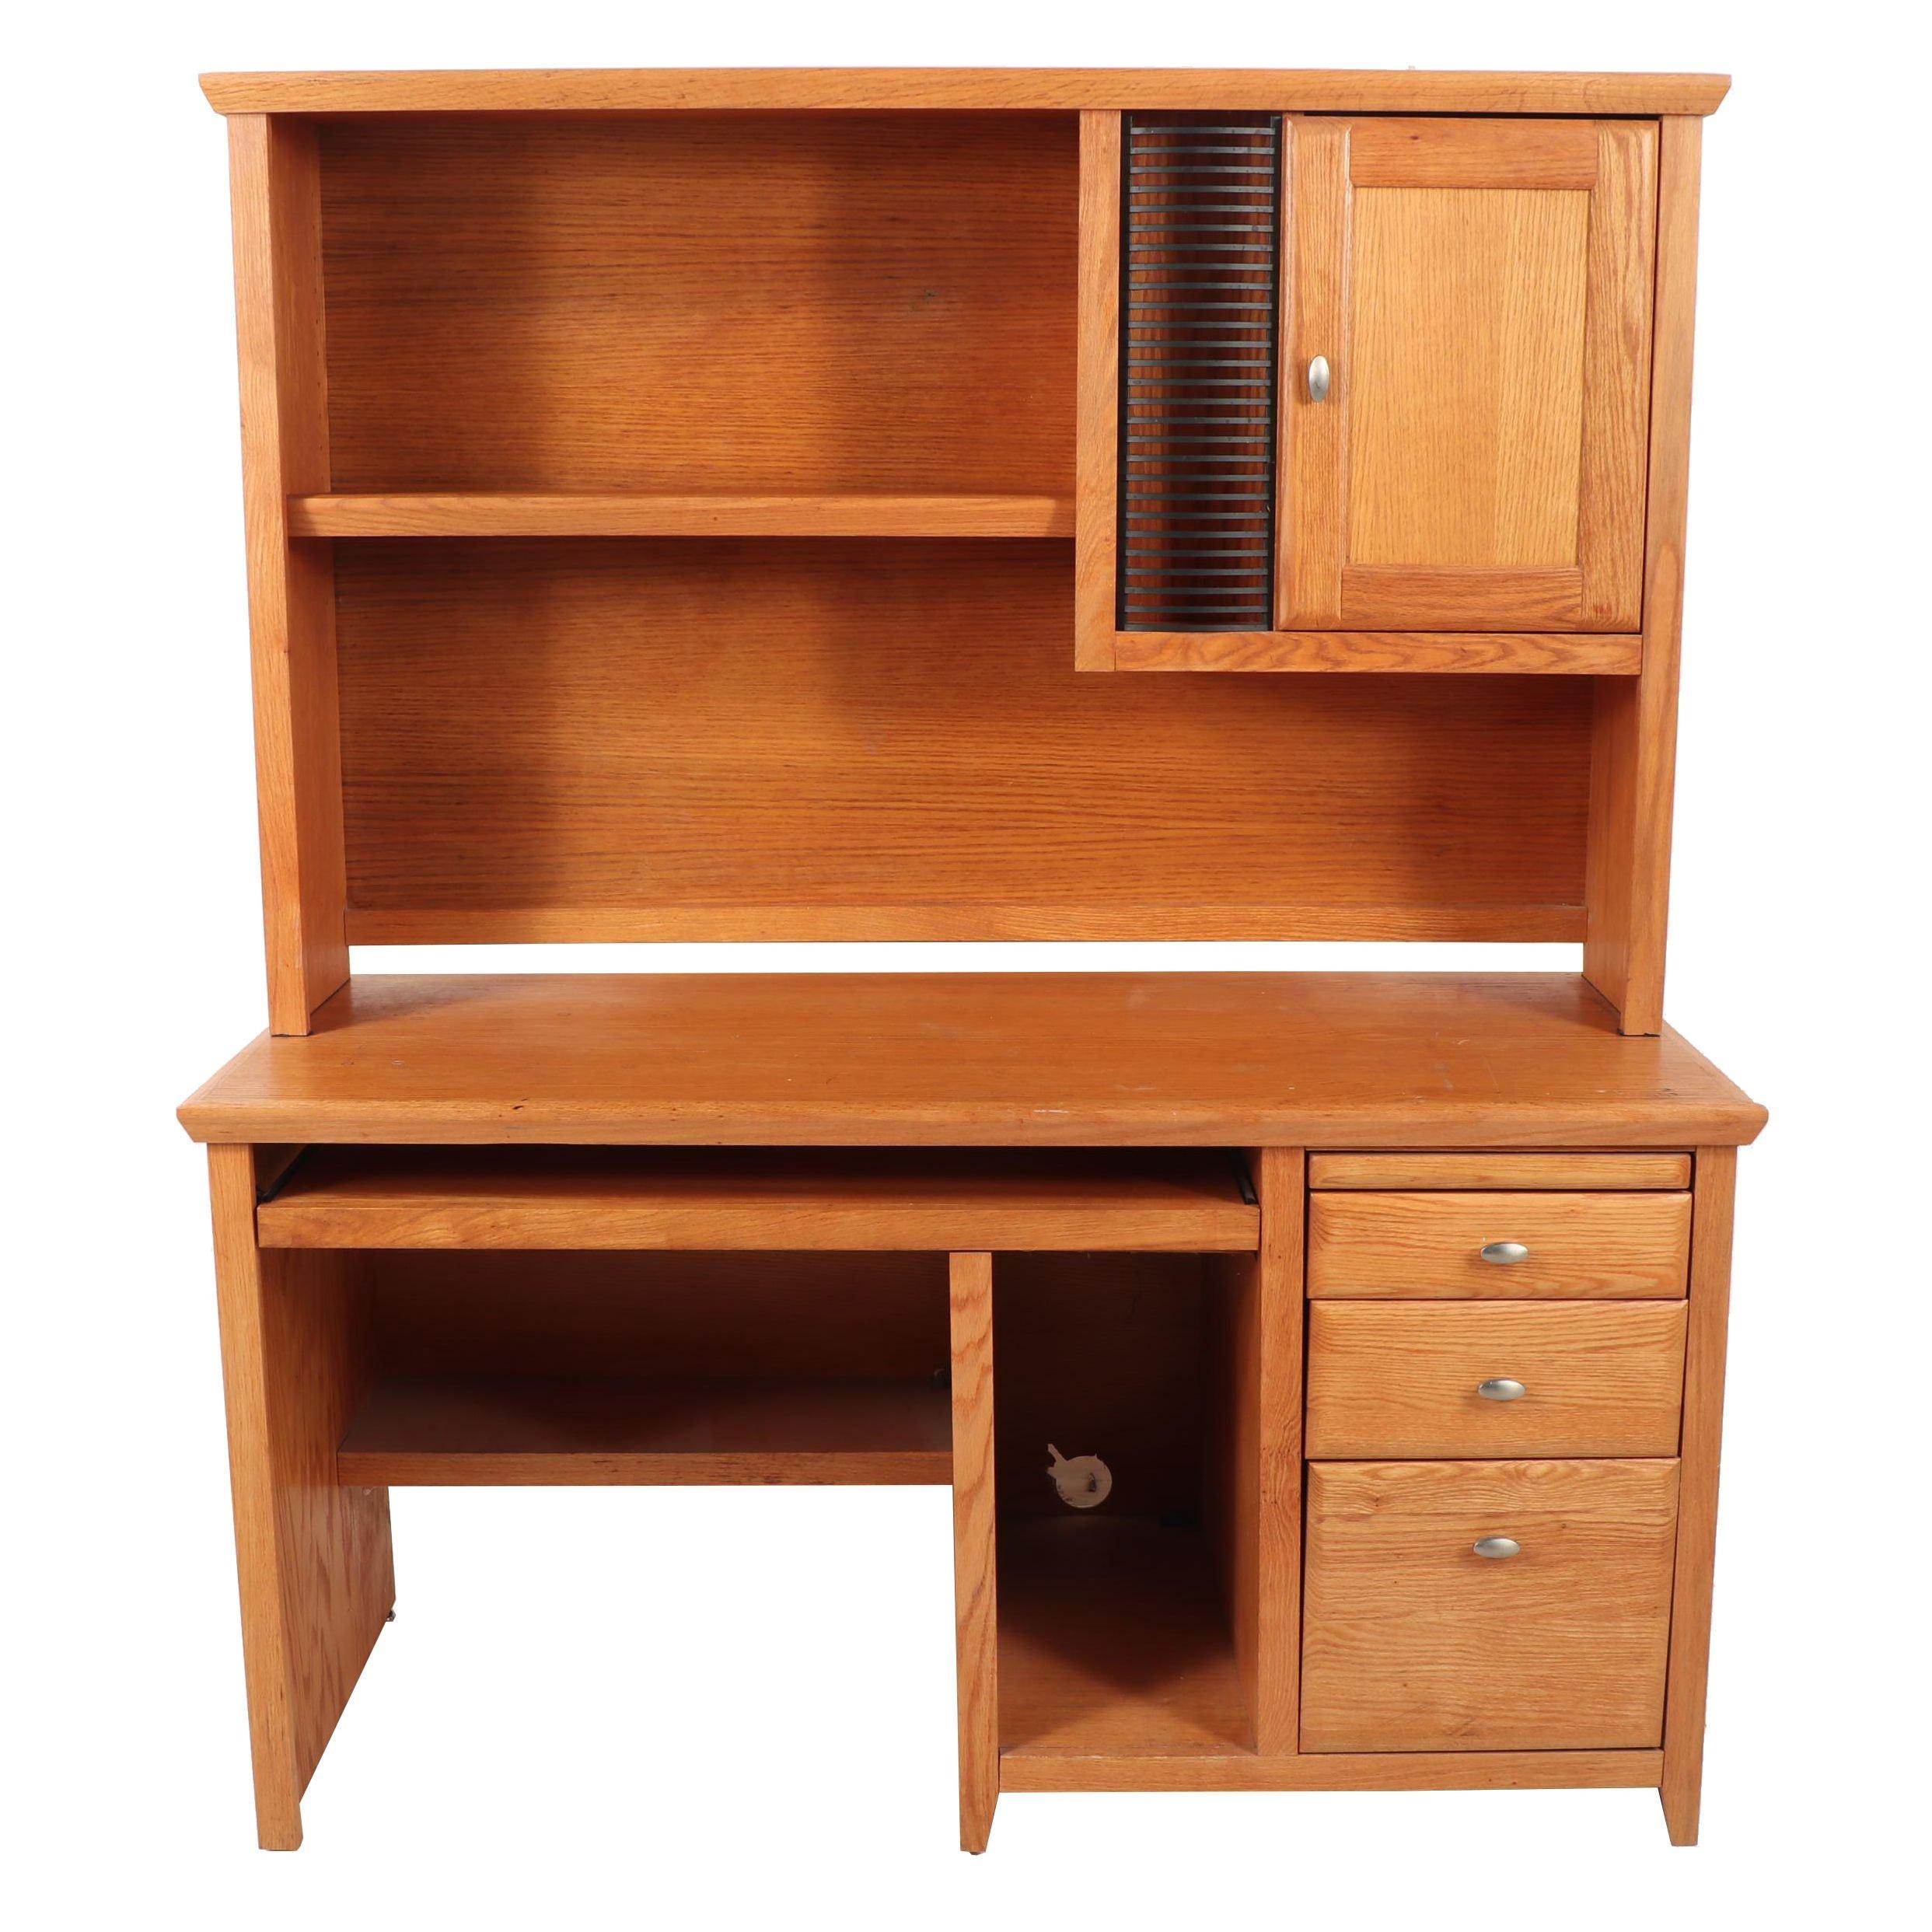 Contemporary Wooden Computer Desk